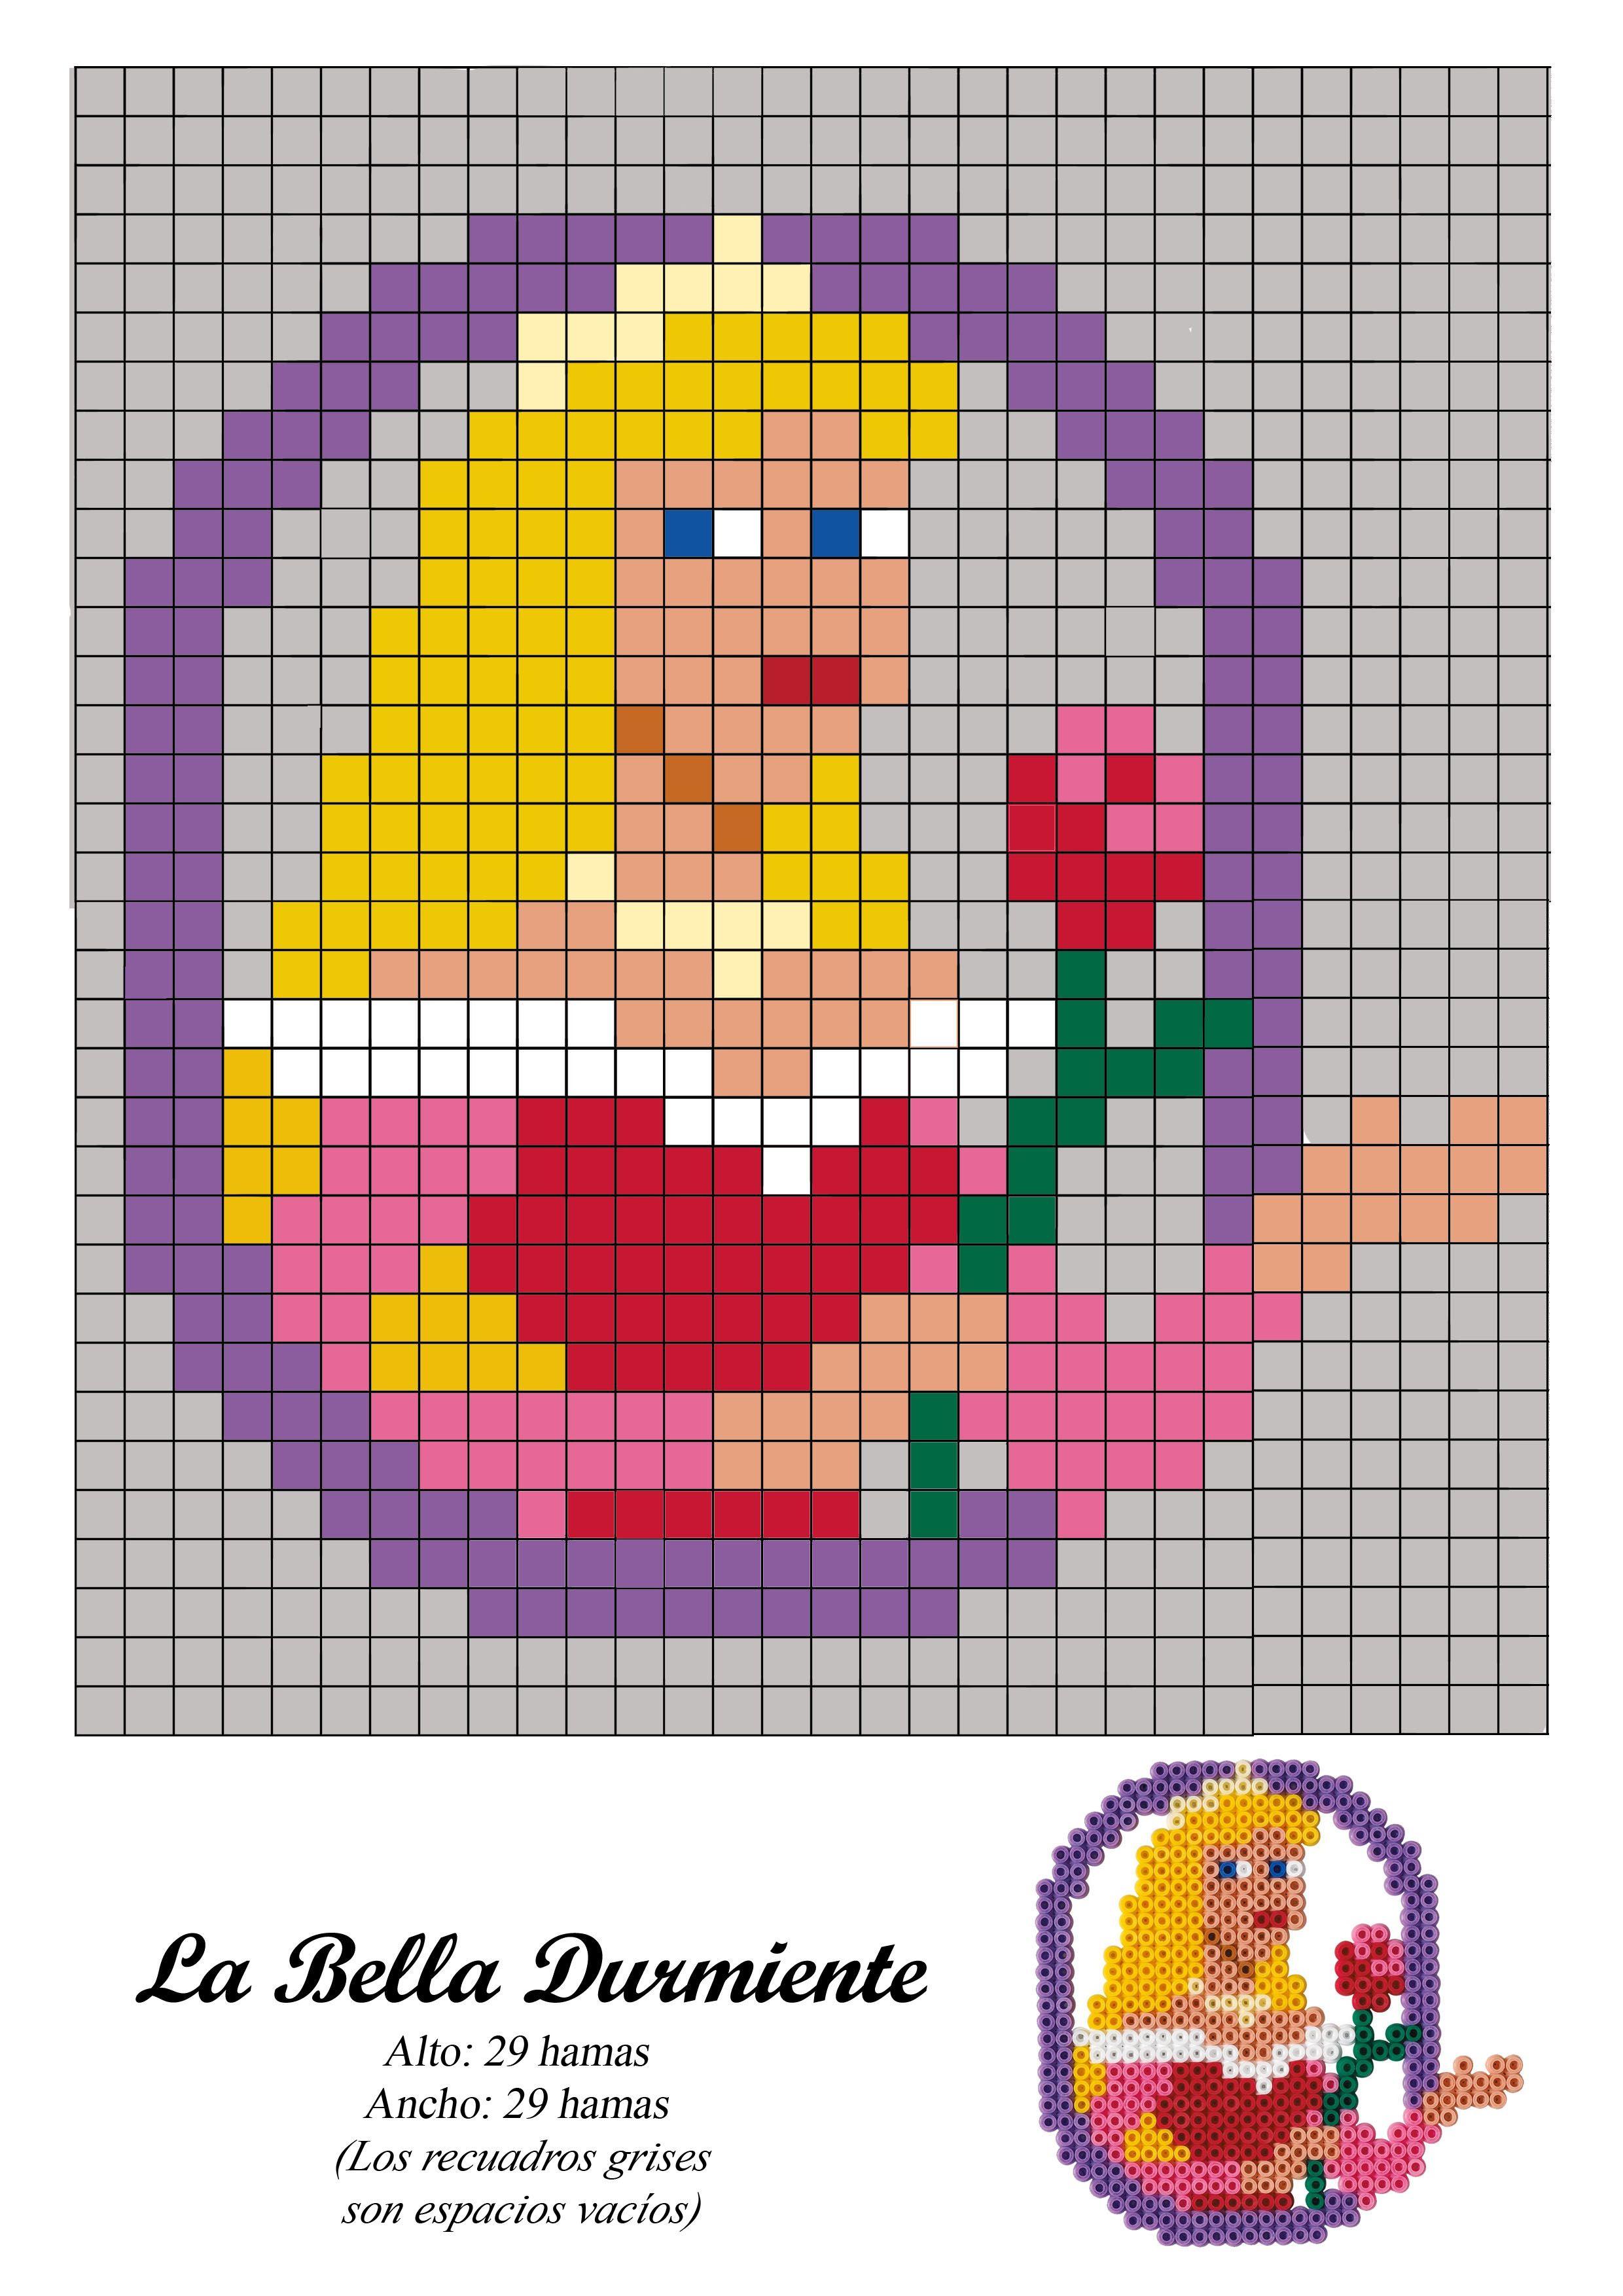 Aurora - Bella Durmiente princesa - Sleeping Beauty princess - hama beads - pattern